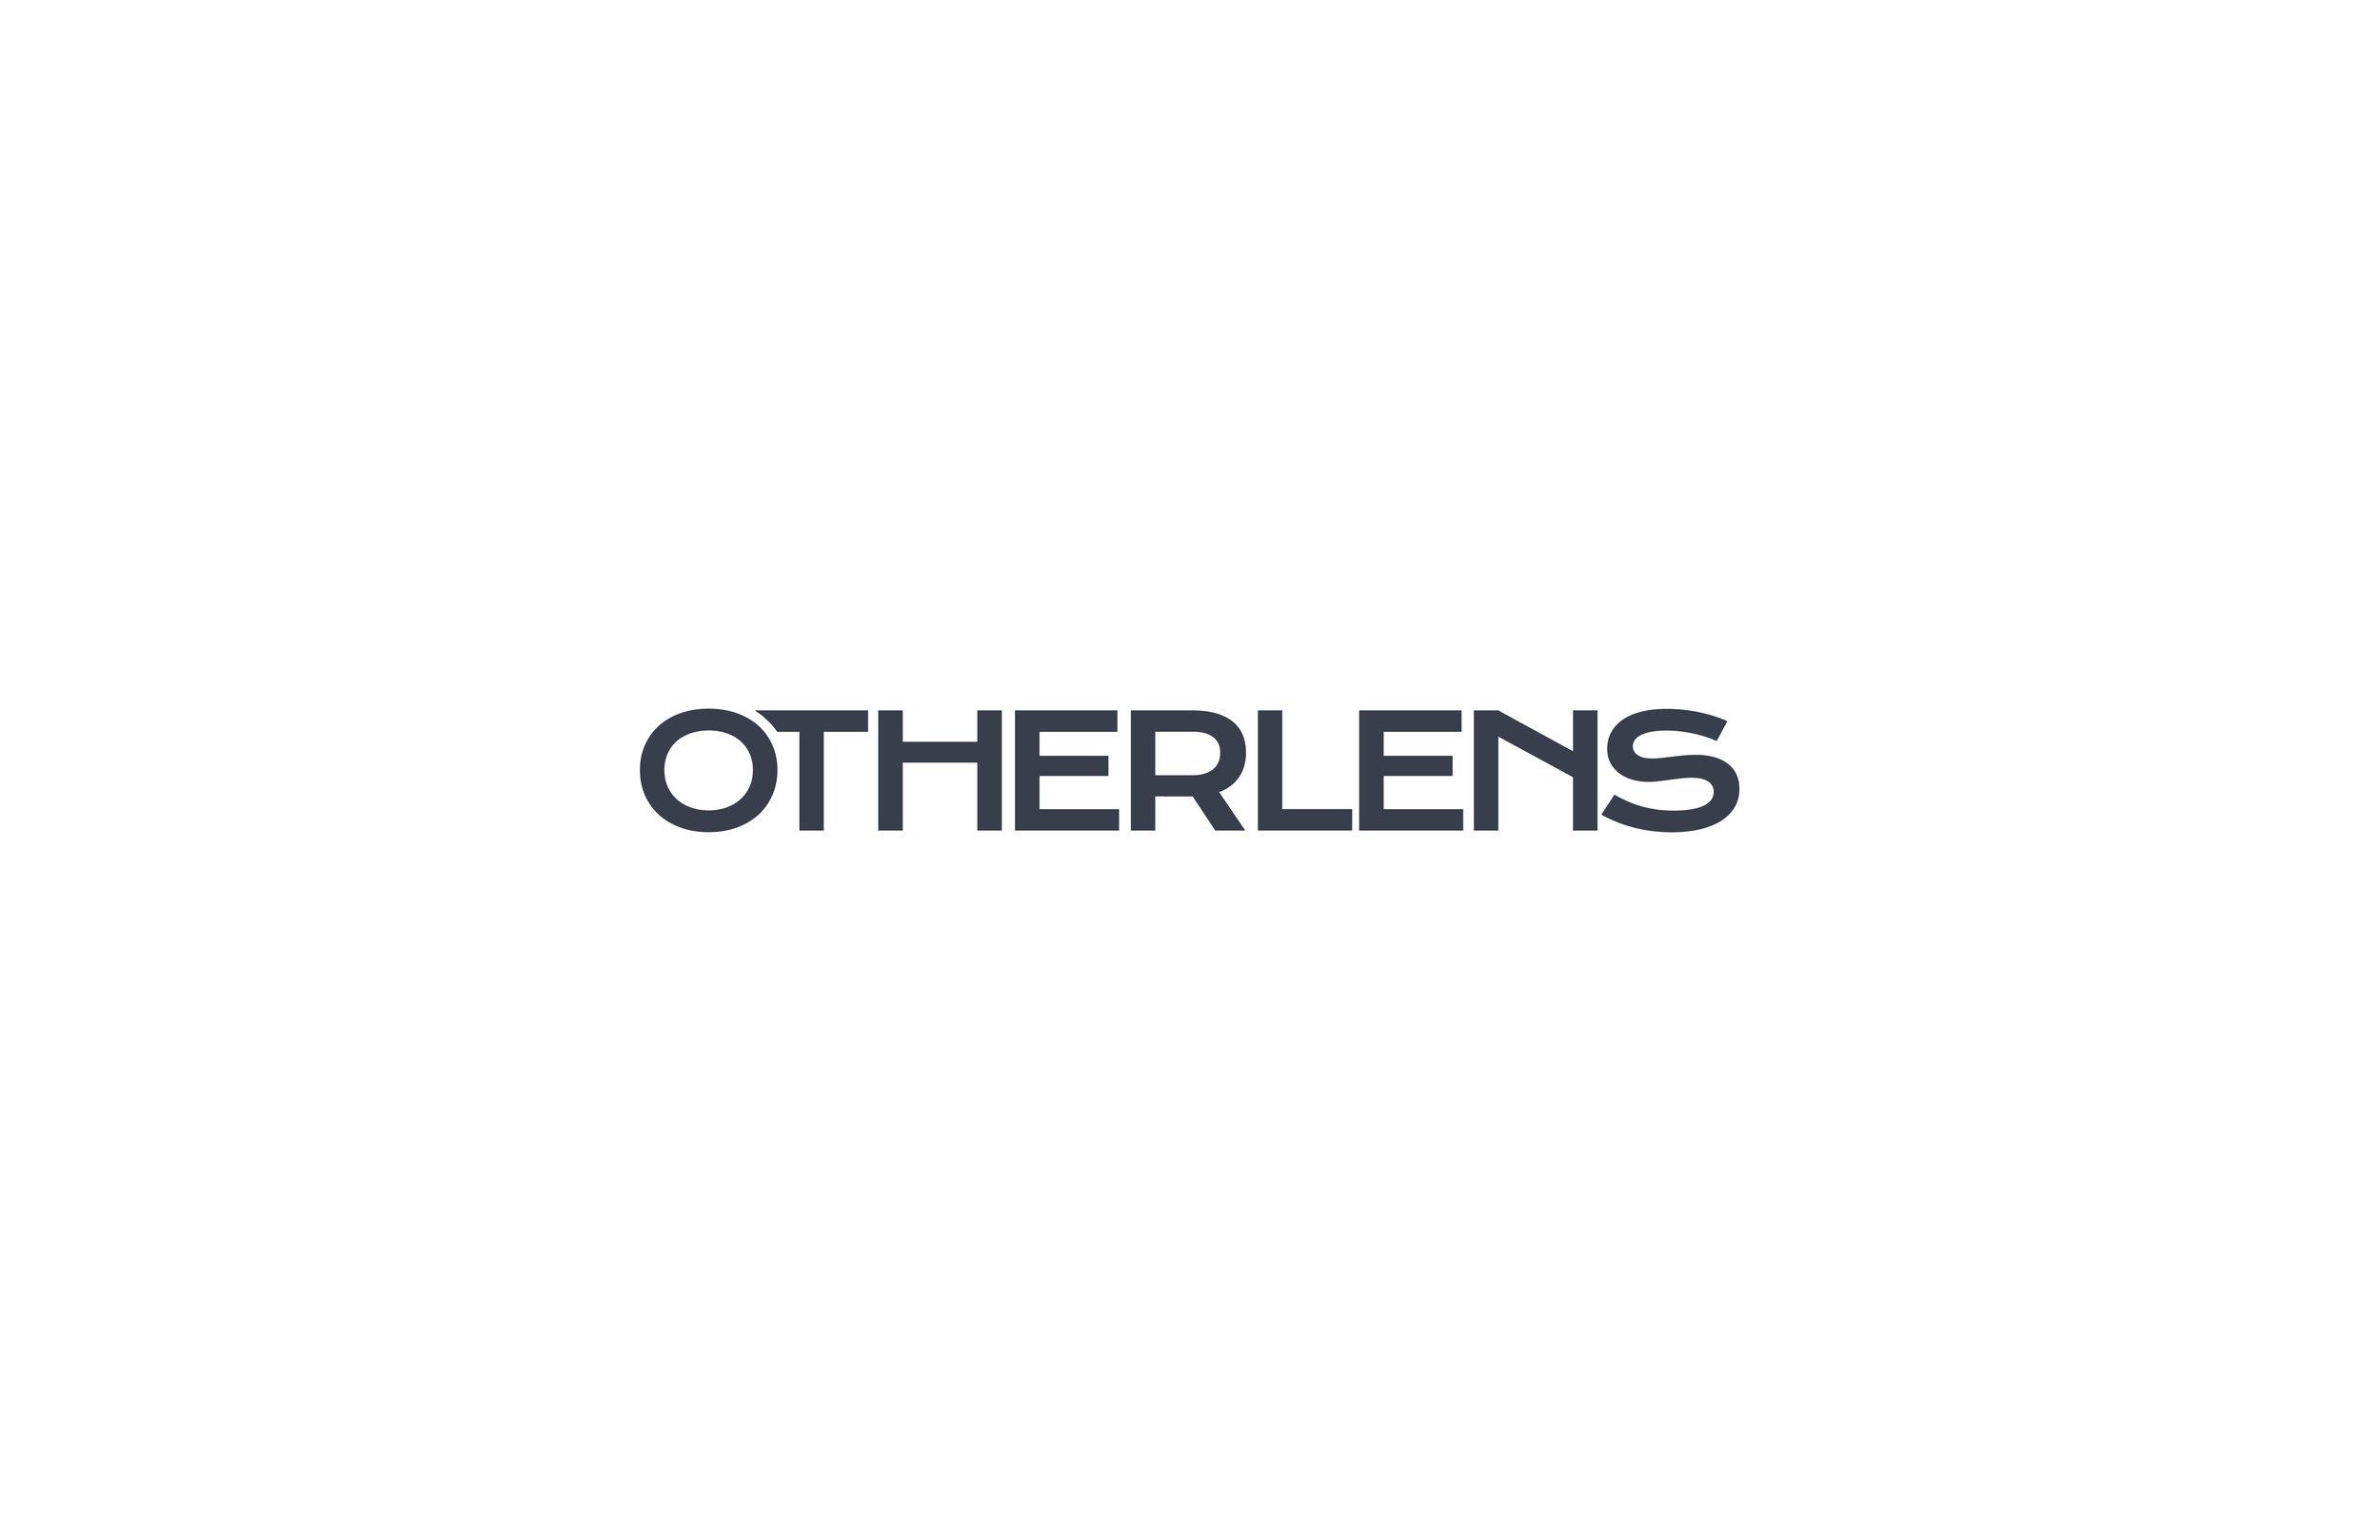 Otherlens_logo-01.jpg